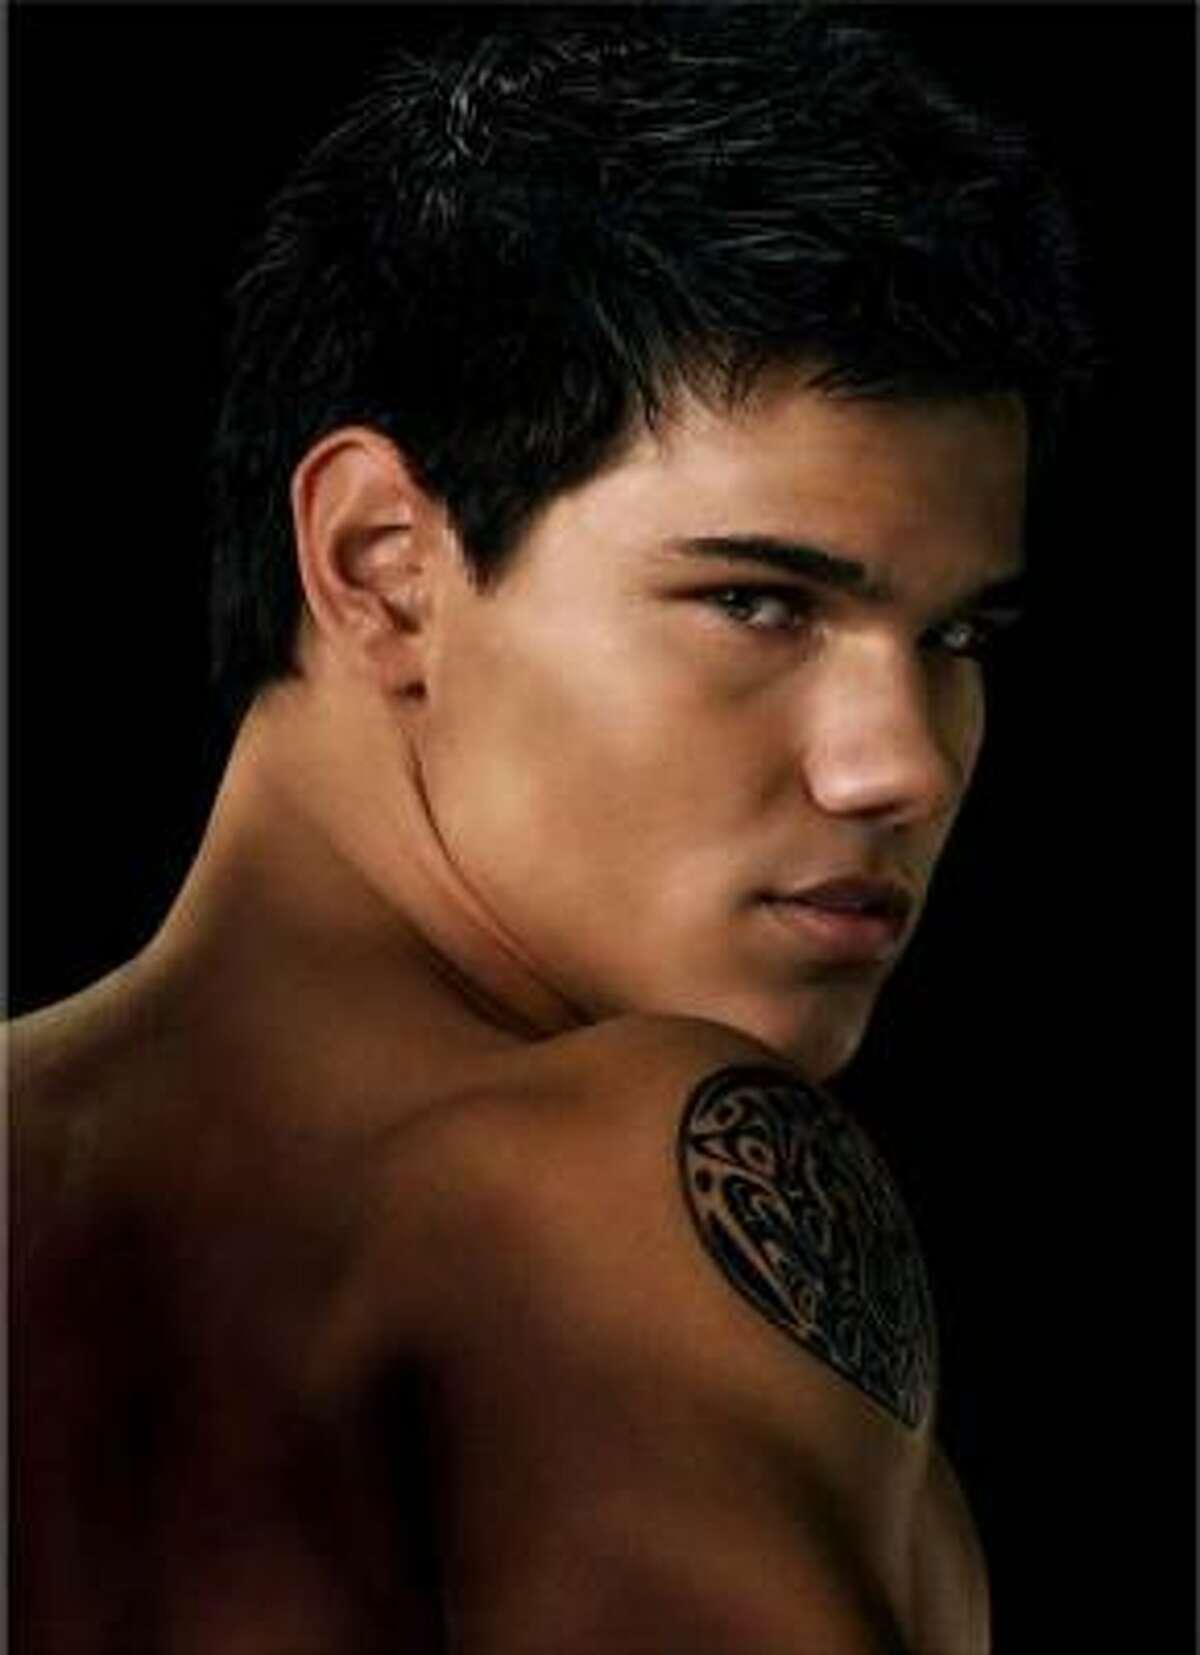 Taylor LautnerThe Twilight series